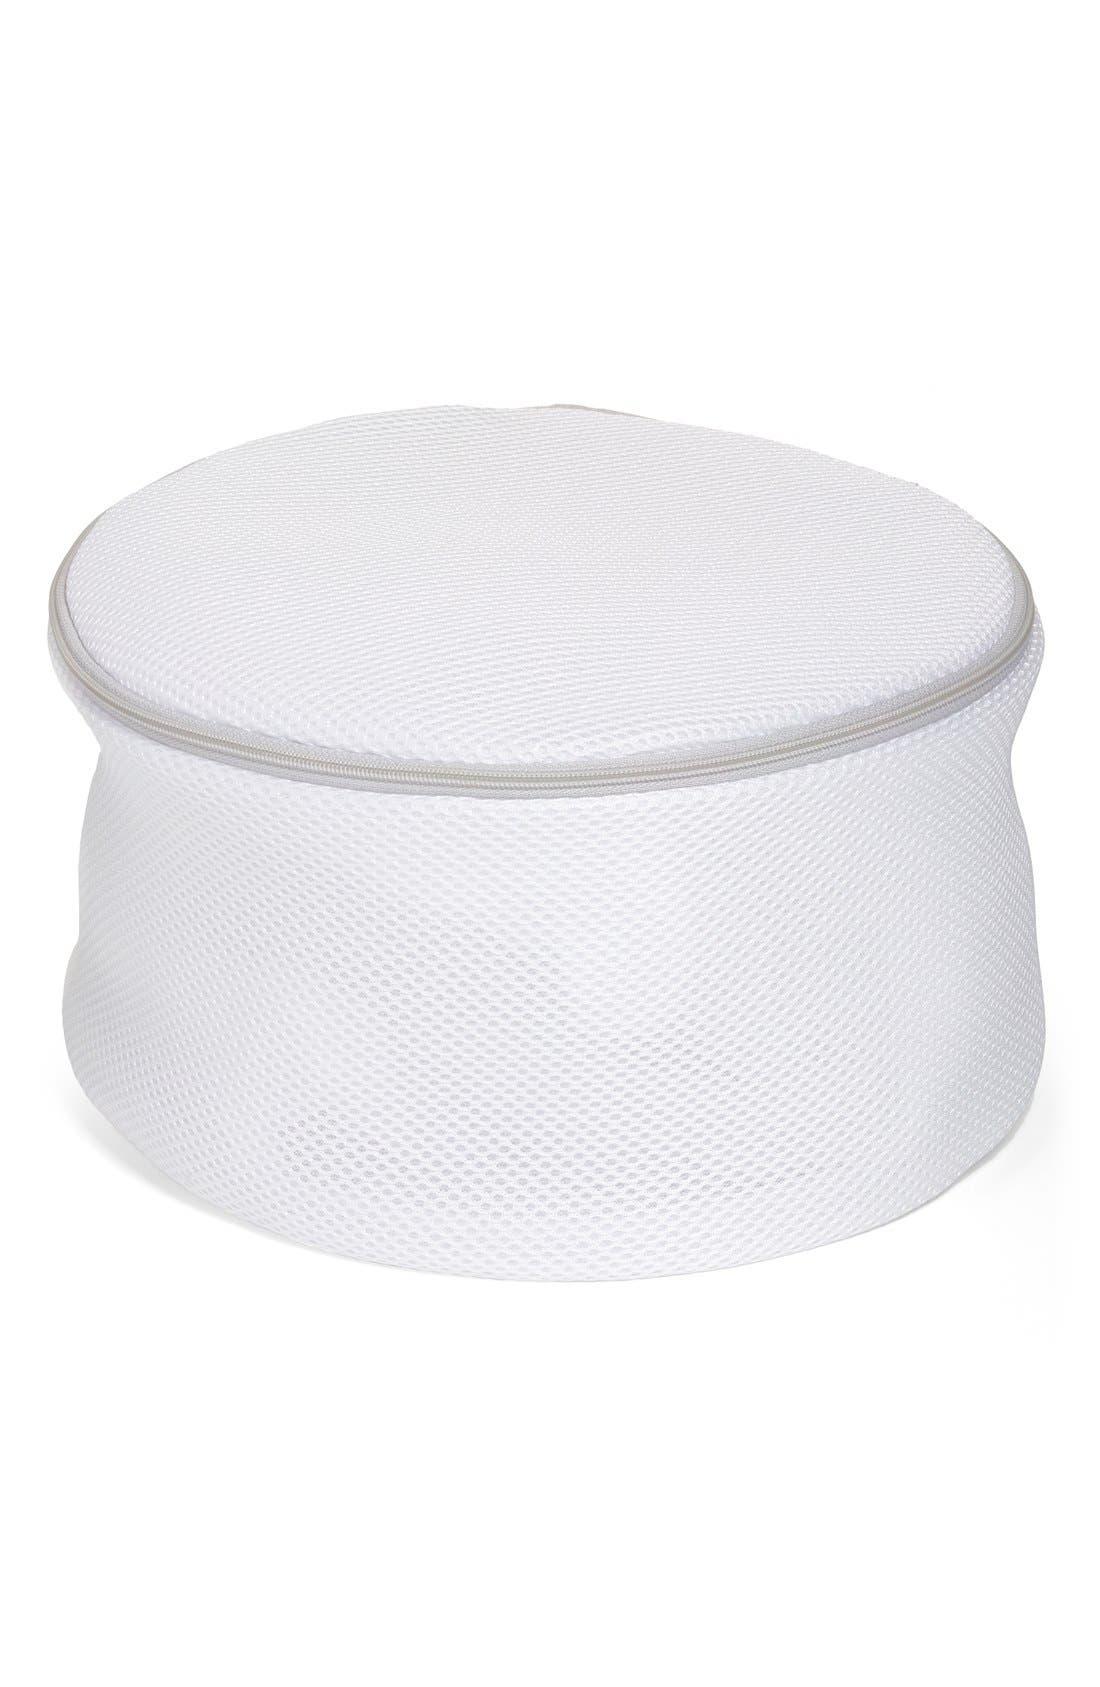 'Bra Saver' Wash Bag,                         Main,                         color, WHITE